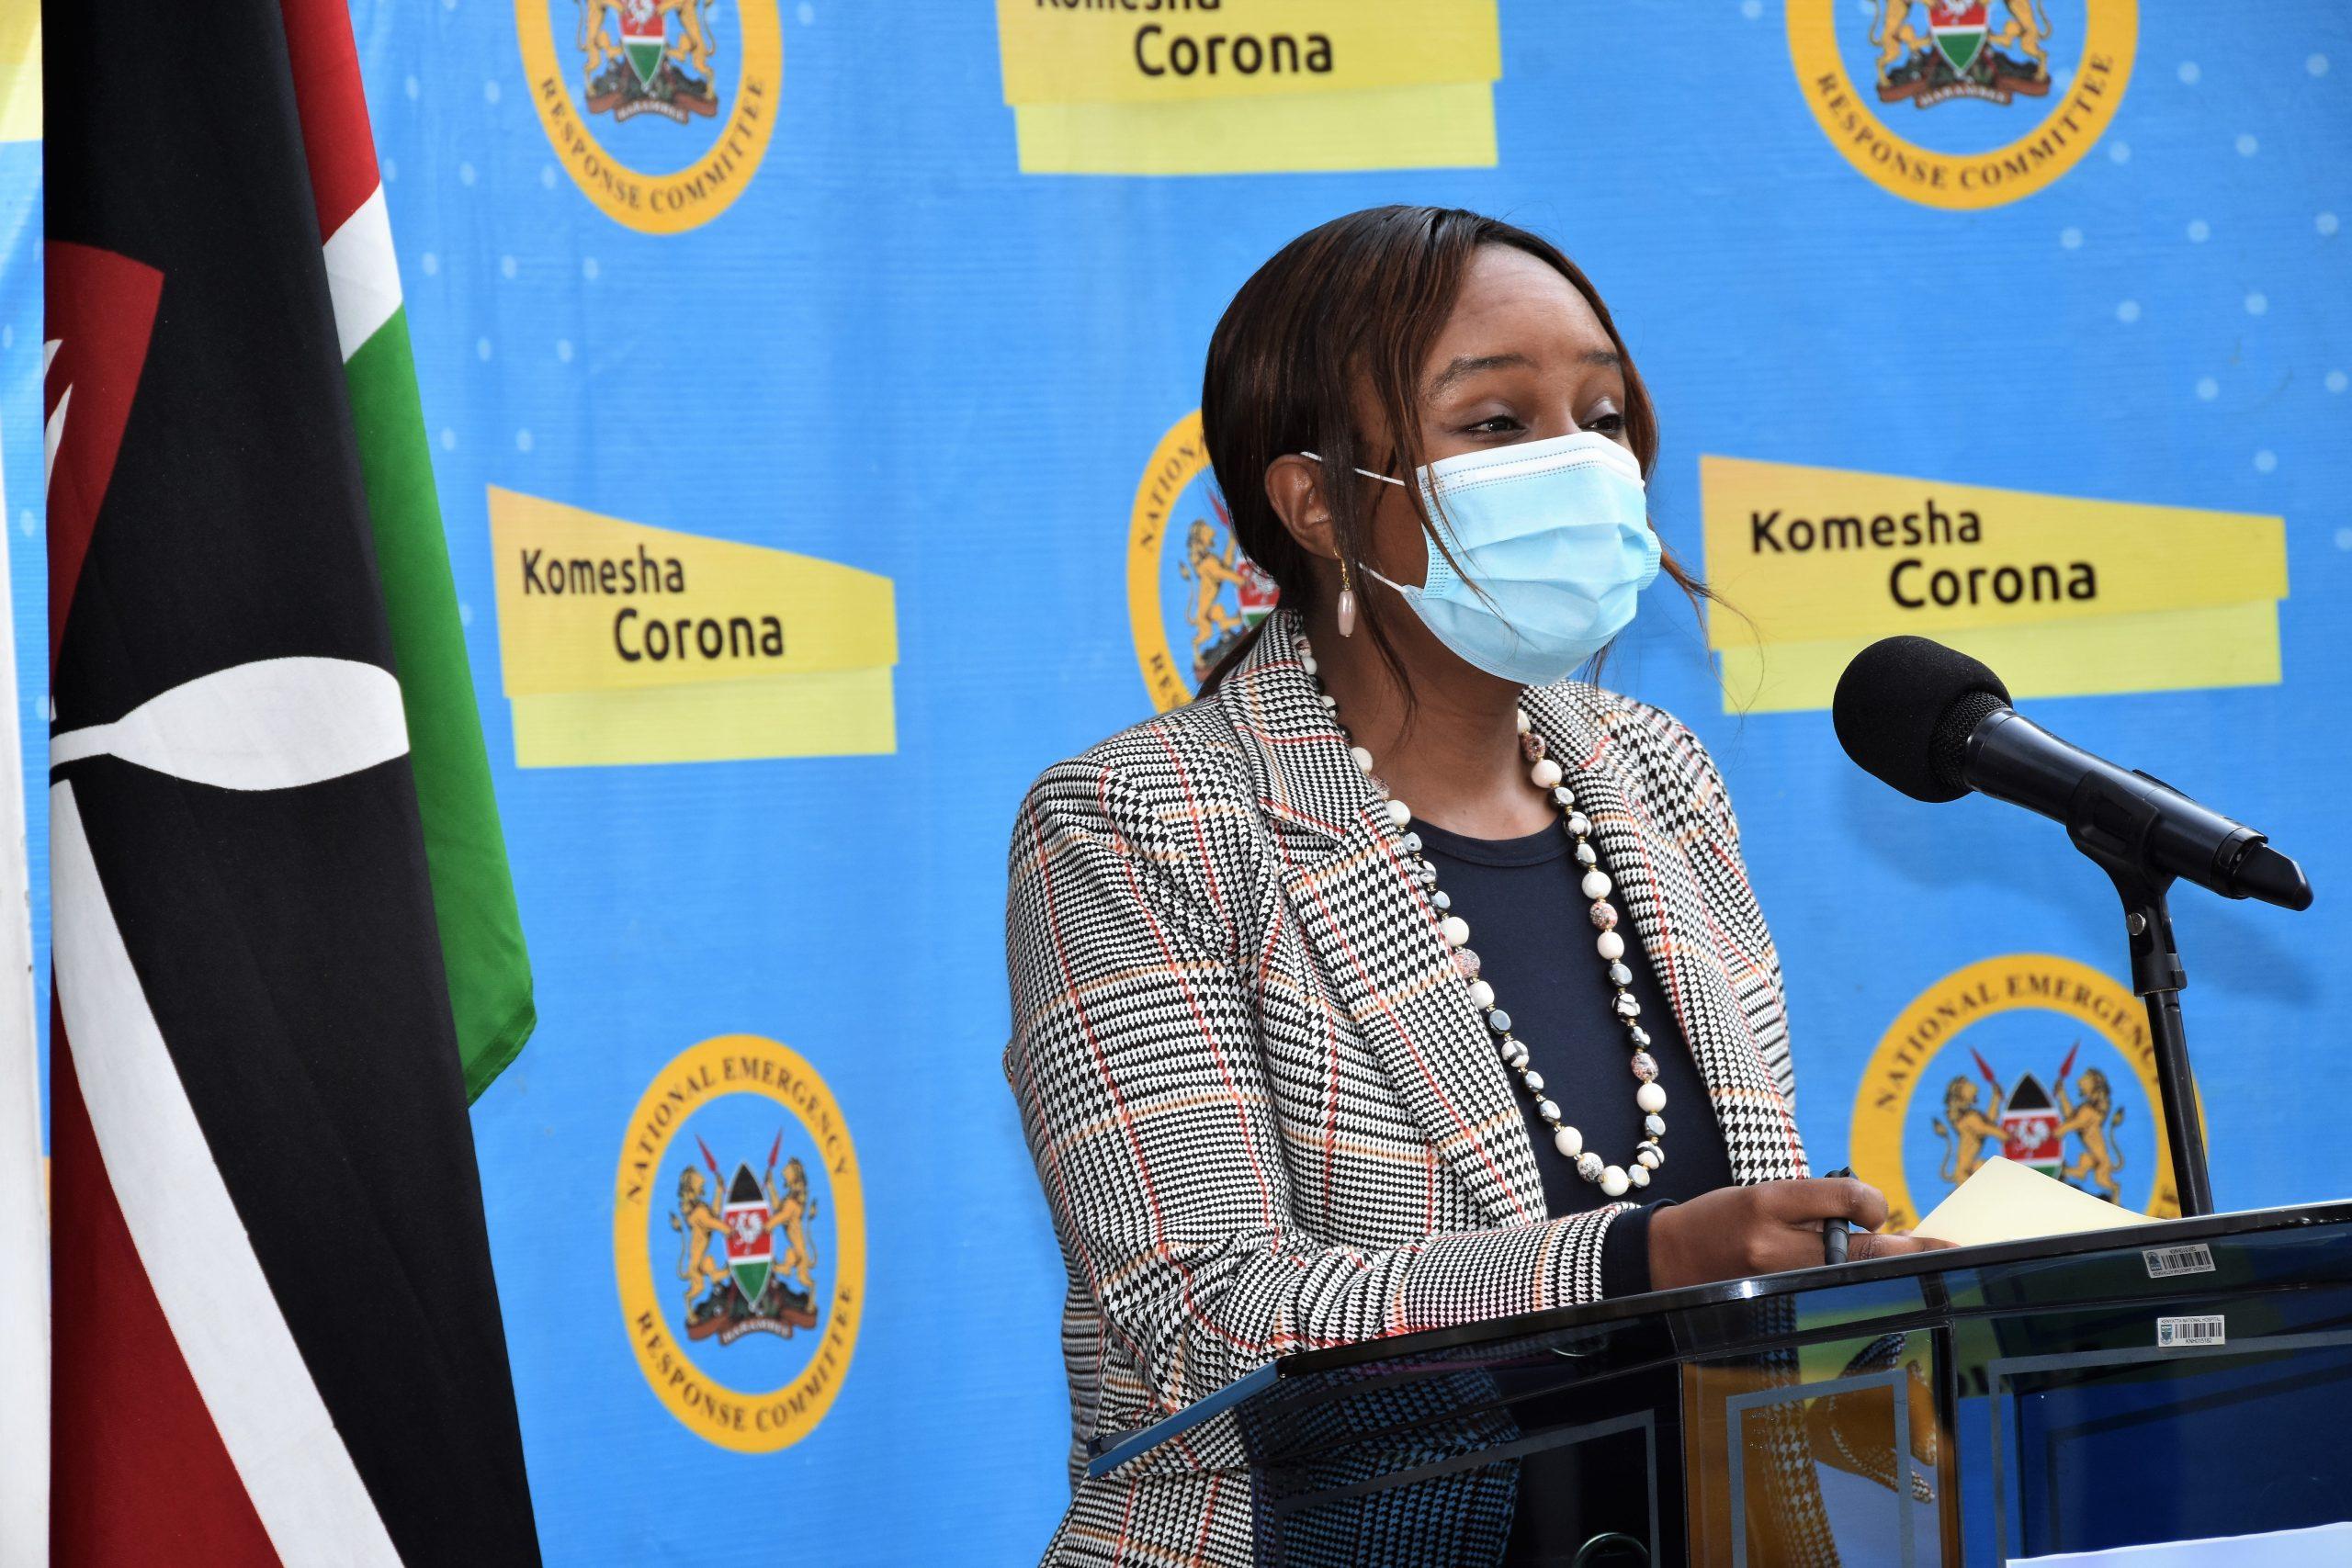 Health Chief Administrative Secretary (CAS) Dr. Mercy Mwangangi